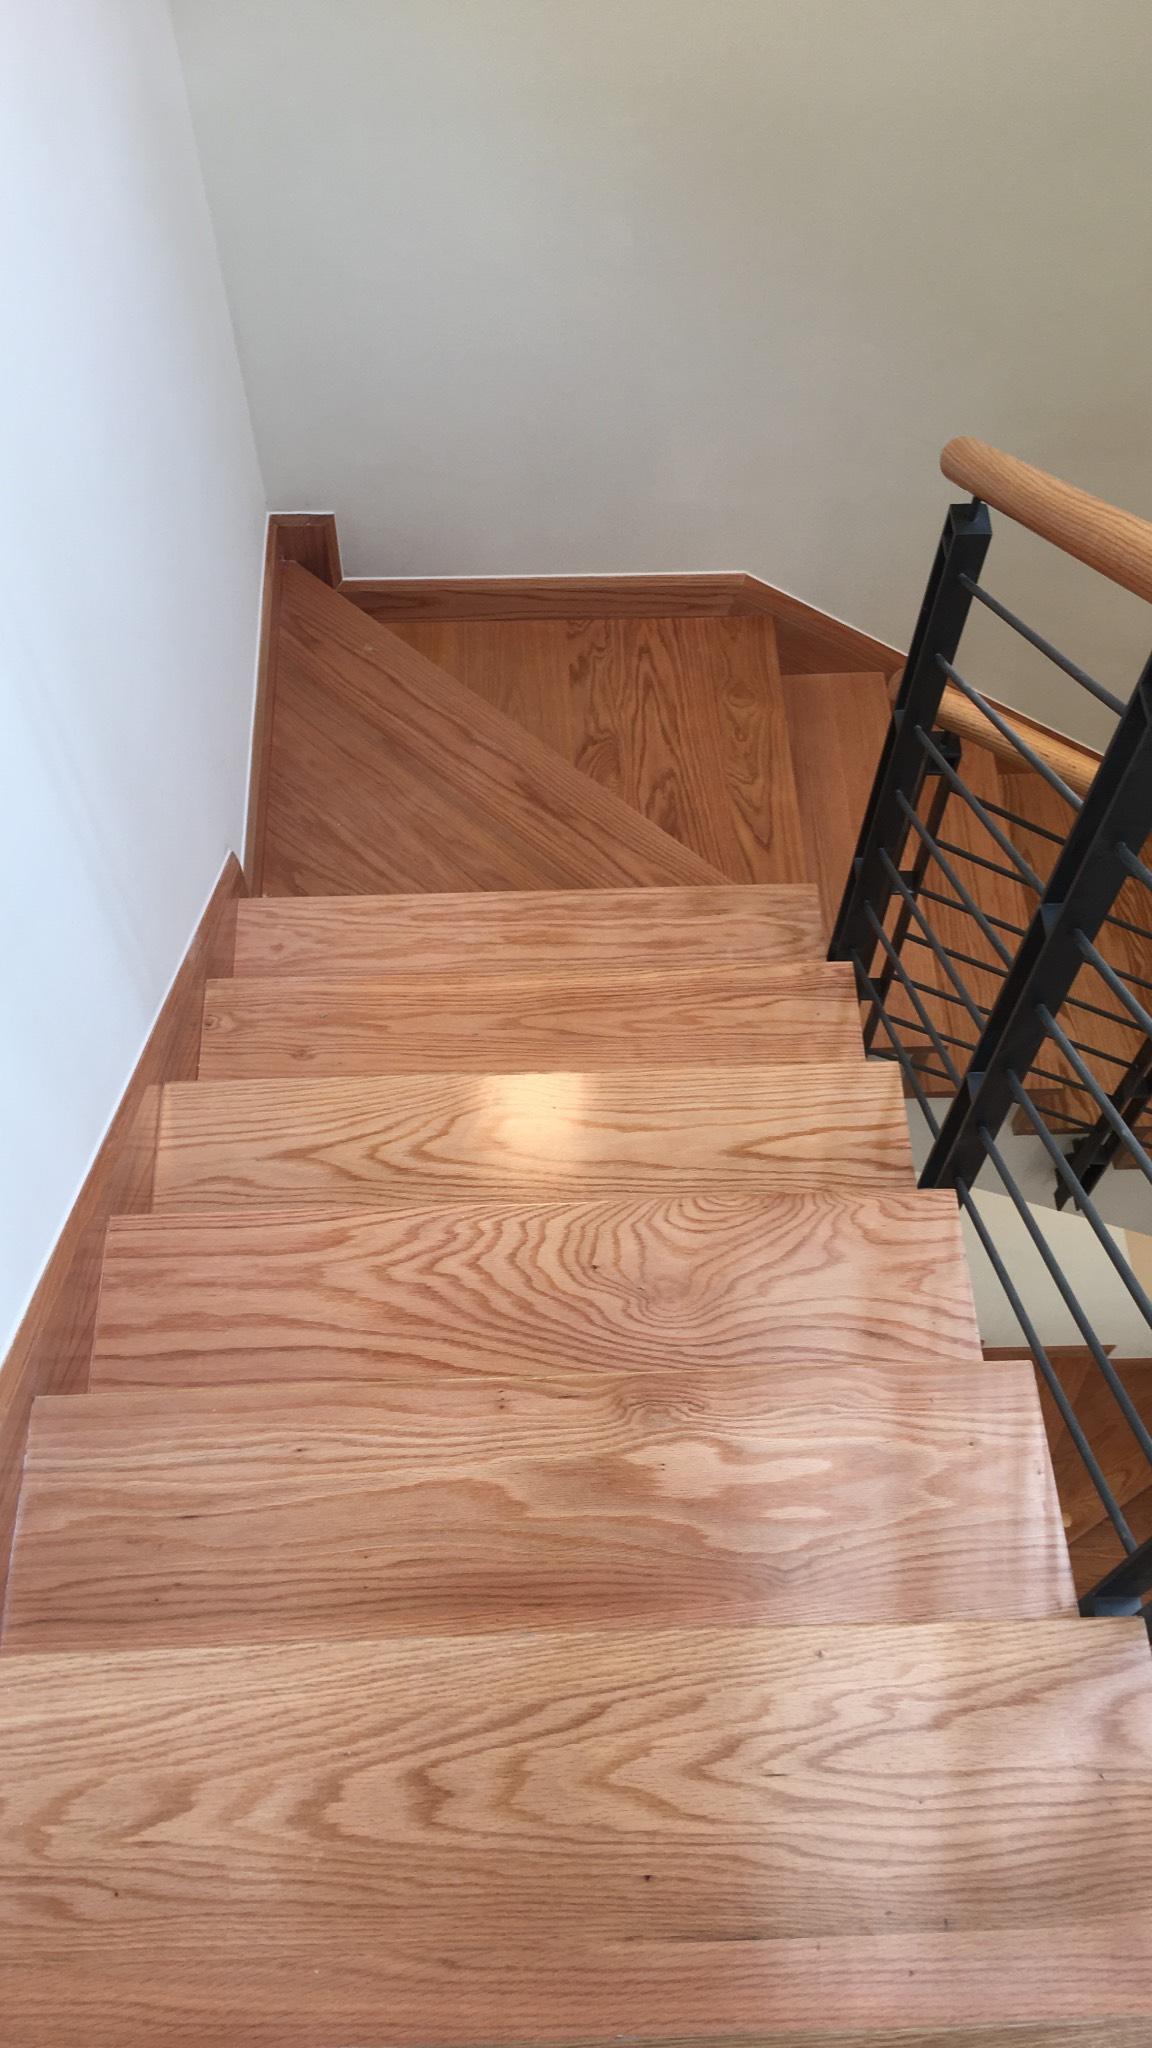 Cầu thang gỗ sồi - Hotline: 0979 777 677